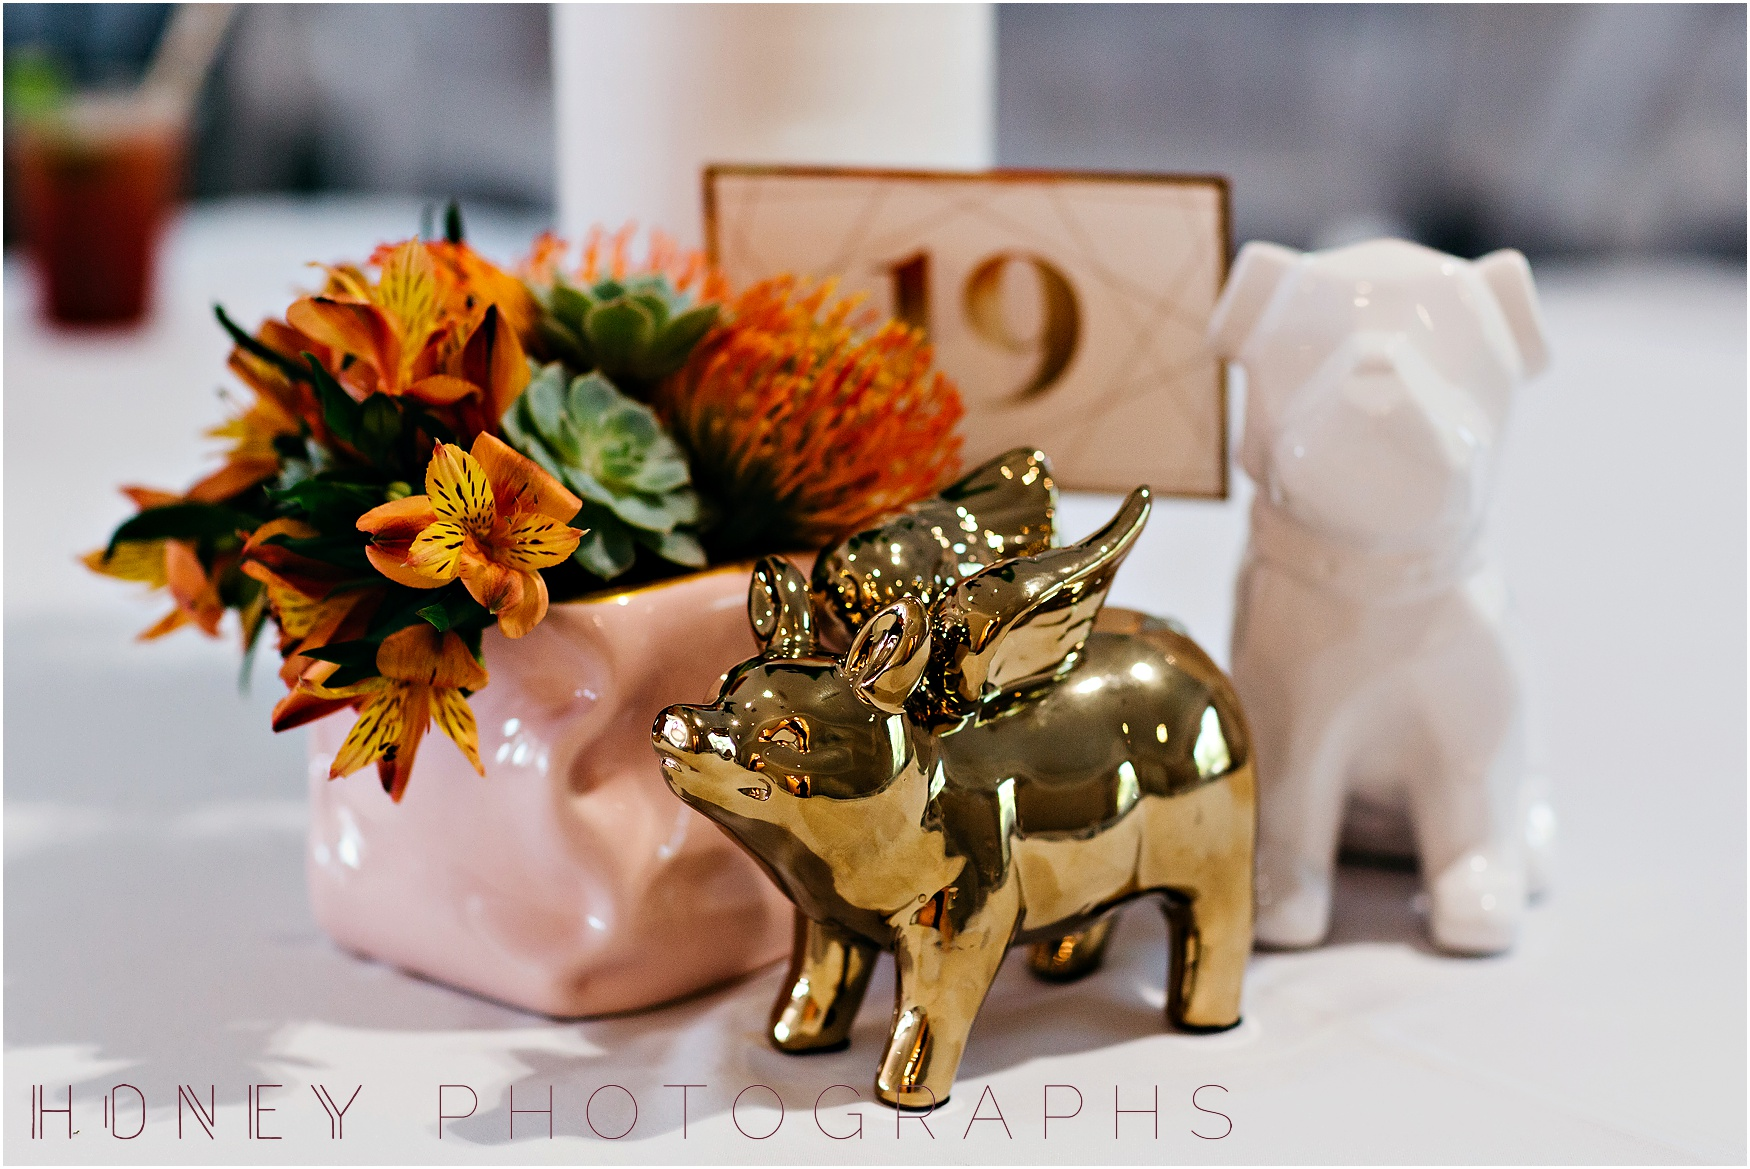 colorful_ecclectic_vibrant_vista_rainbow_quirky_wedding038.jpg